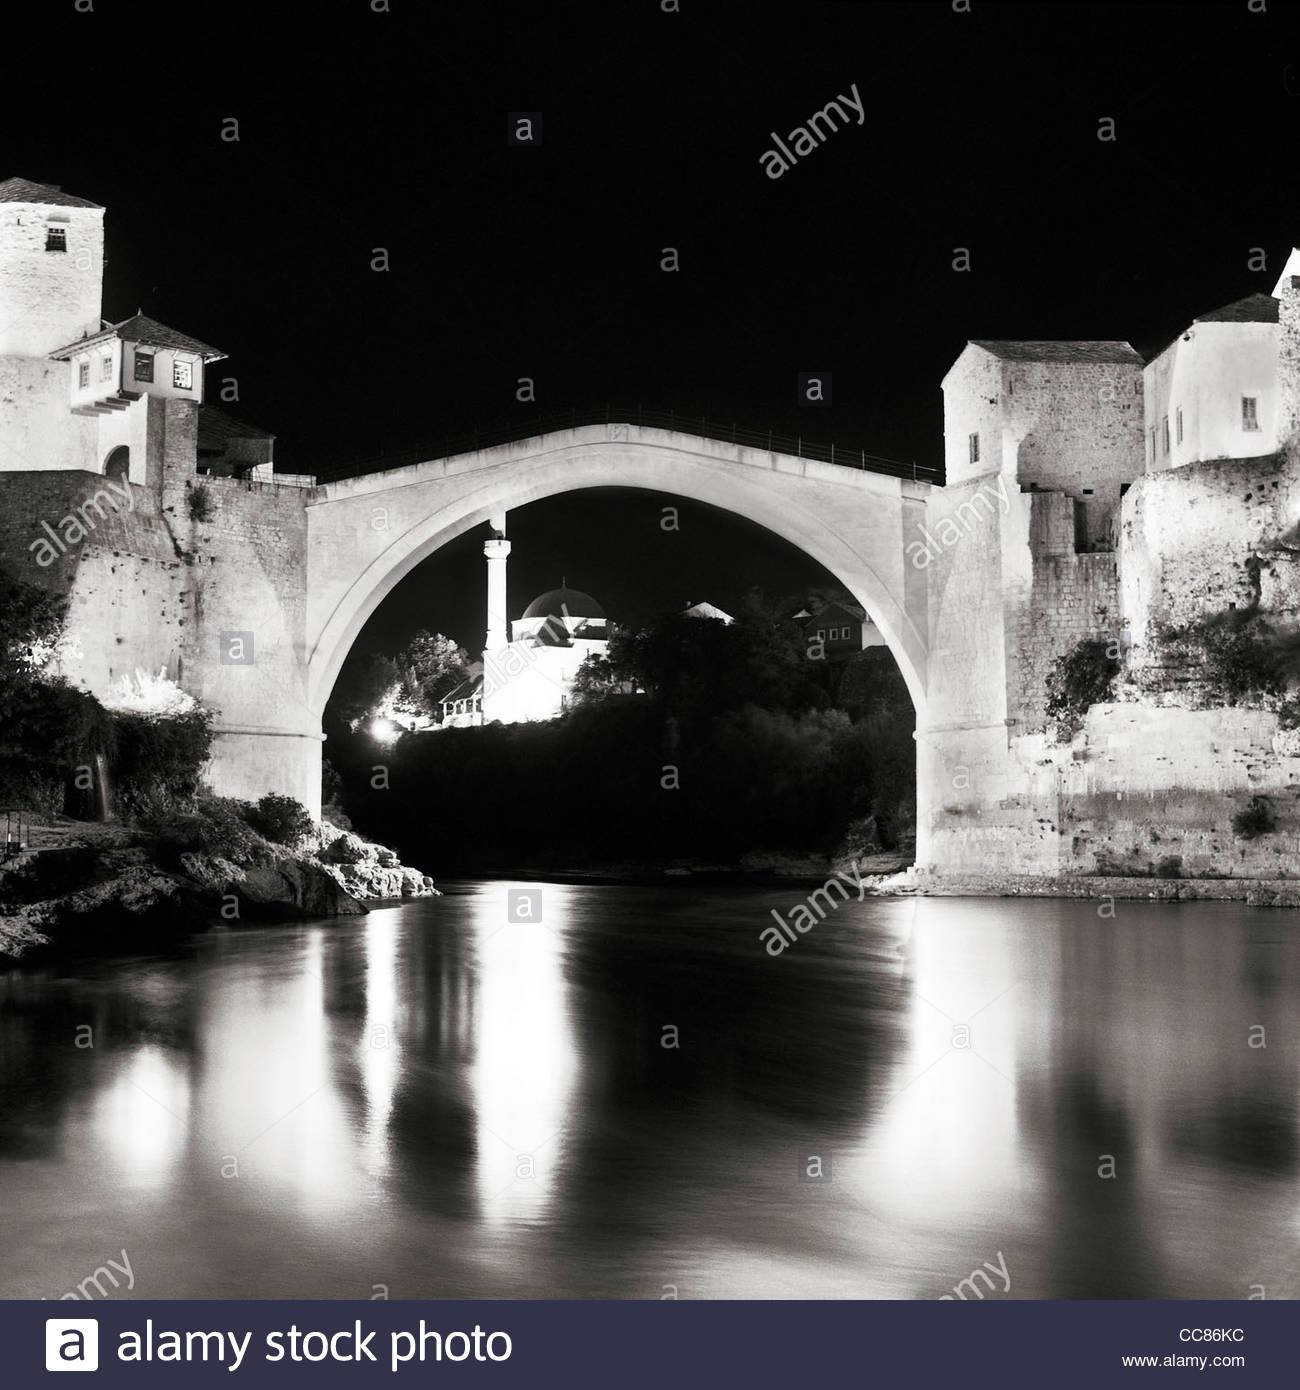 Stari Most (Old Bridge) over Neretva river at night, Mostar, Bosnia and Herzegovina - Stock Image